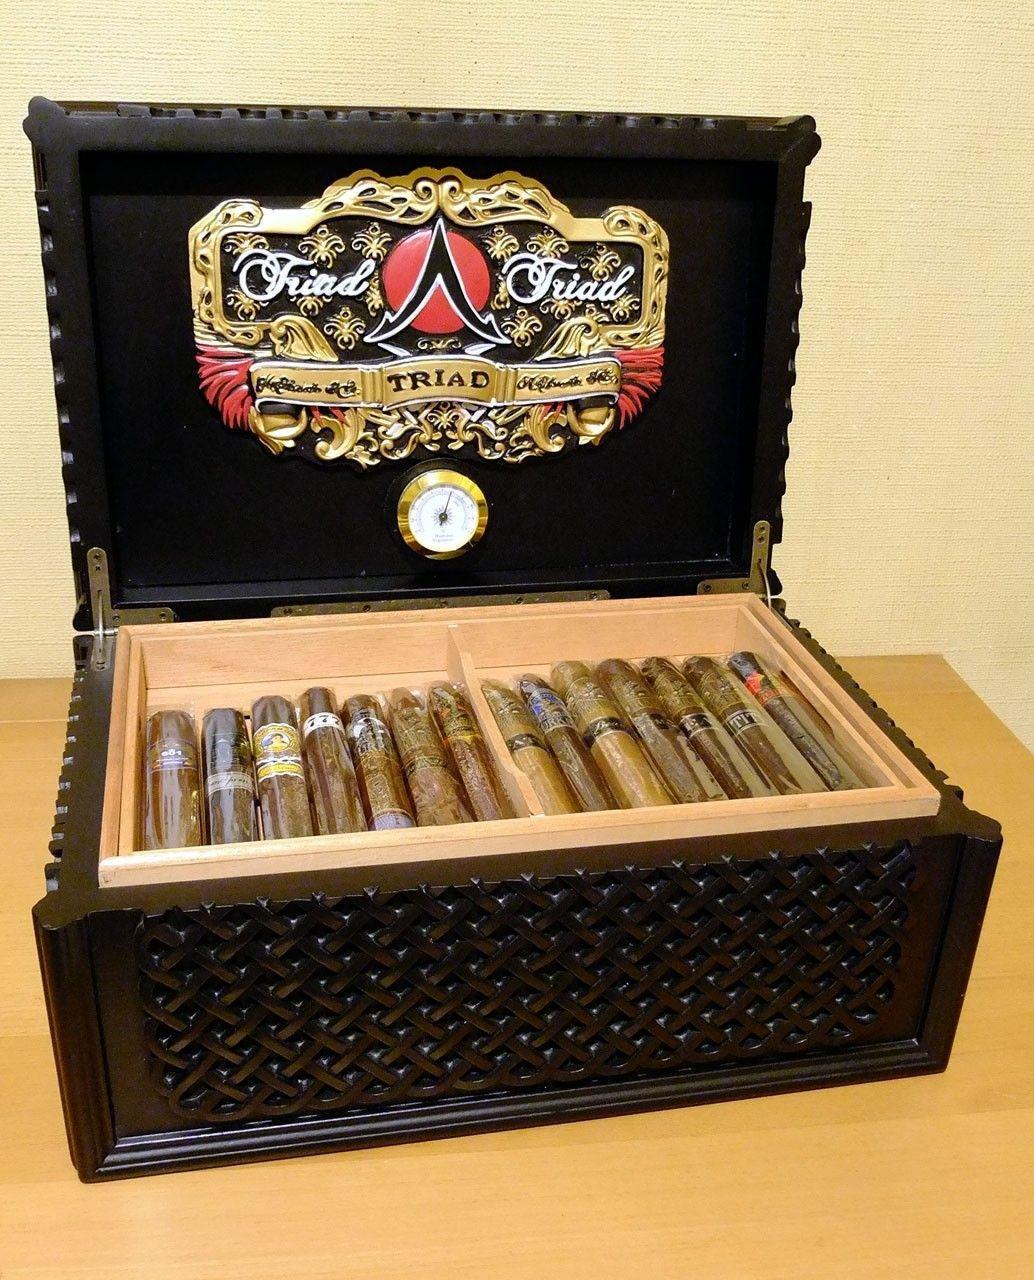 Cigars - 1570-1400530689-8886333d33c437bfb55632736e7c4171.jpg